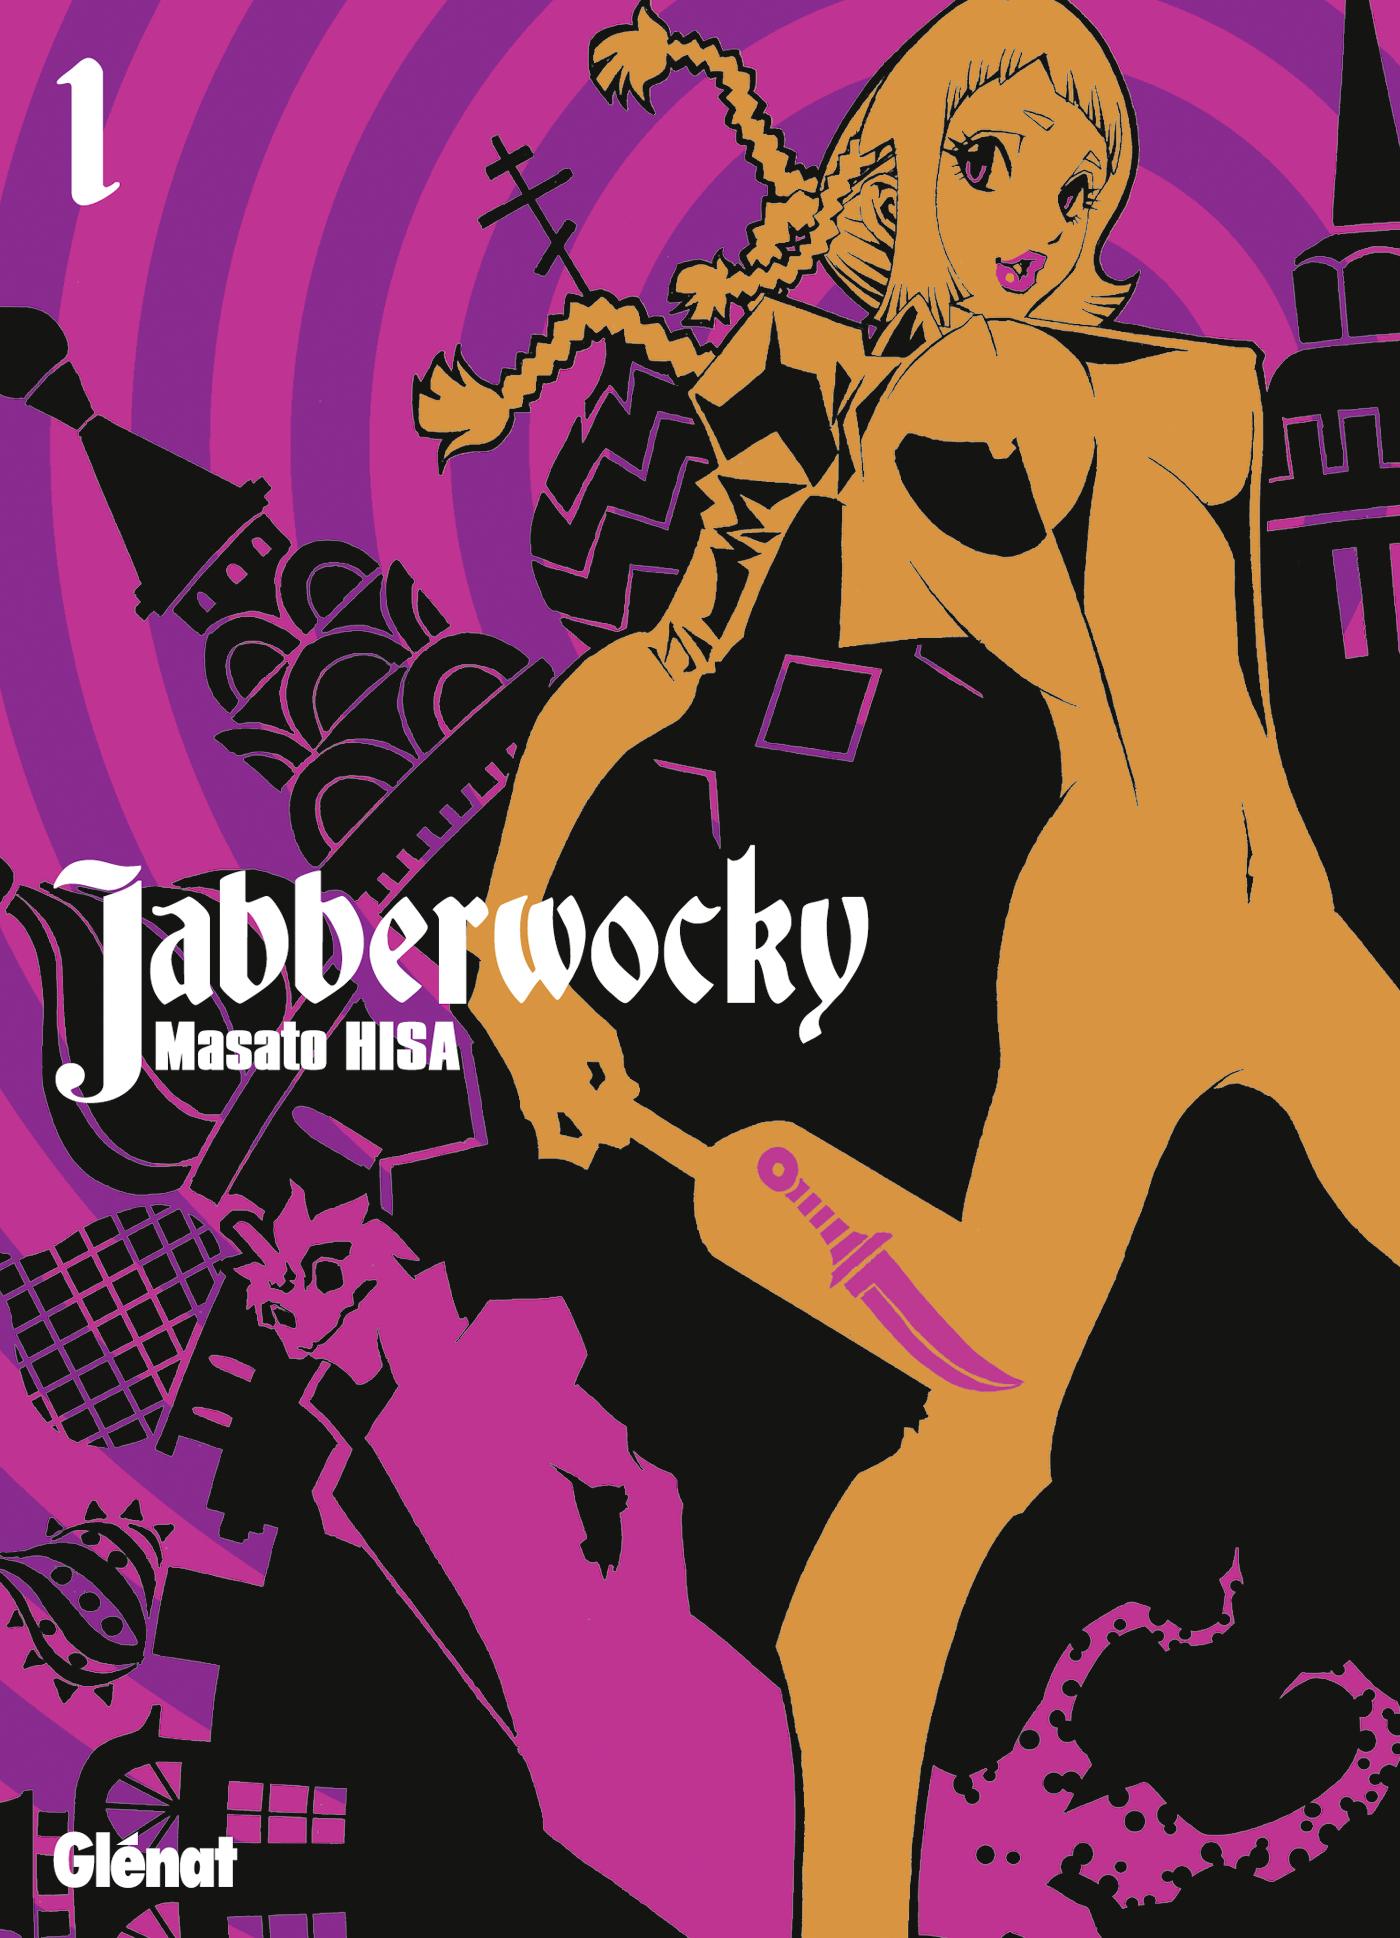 Jabberwocky 1